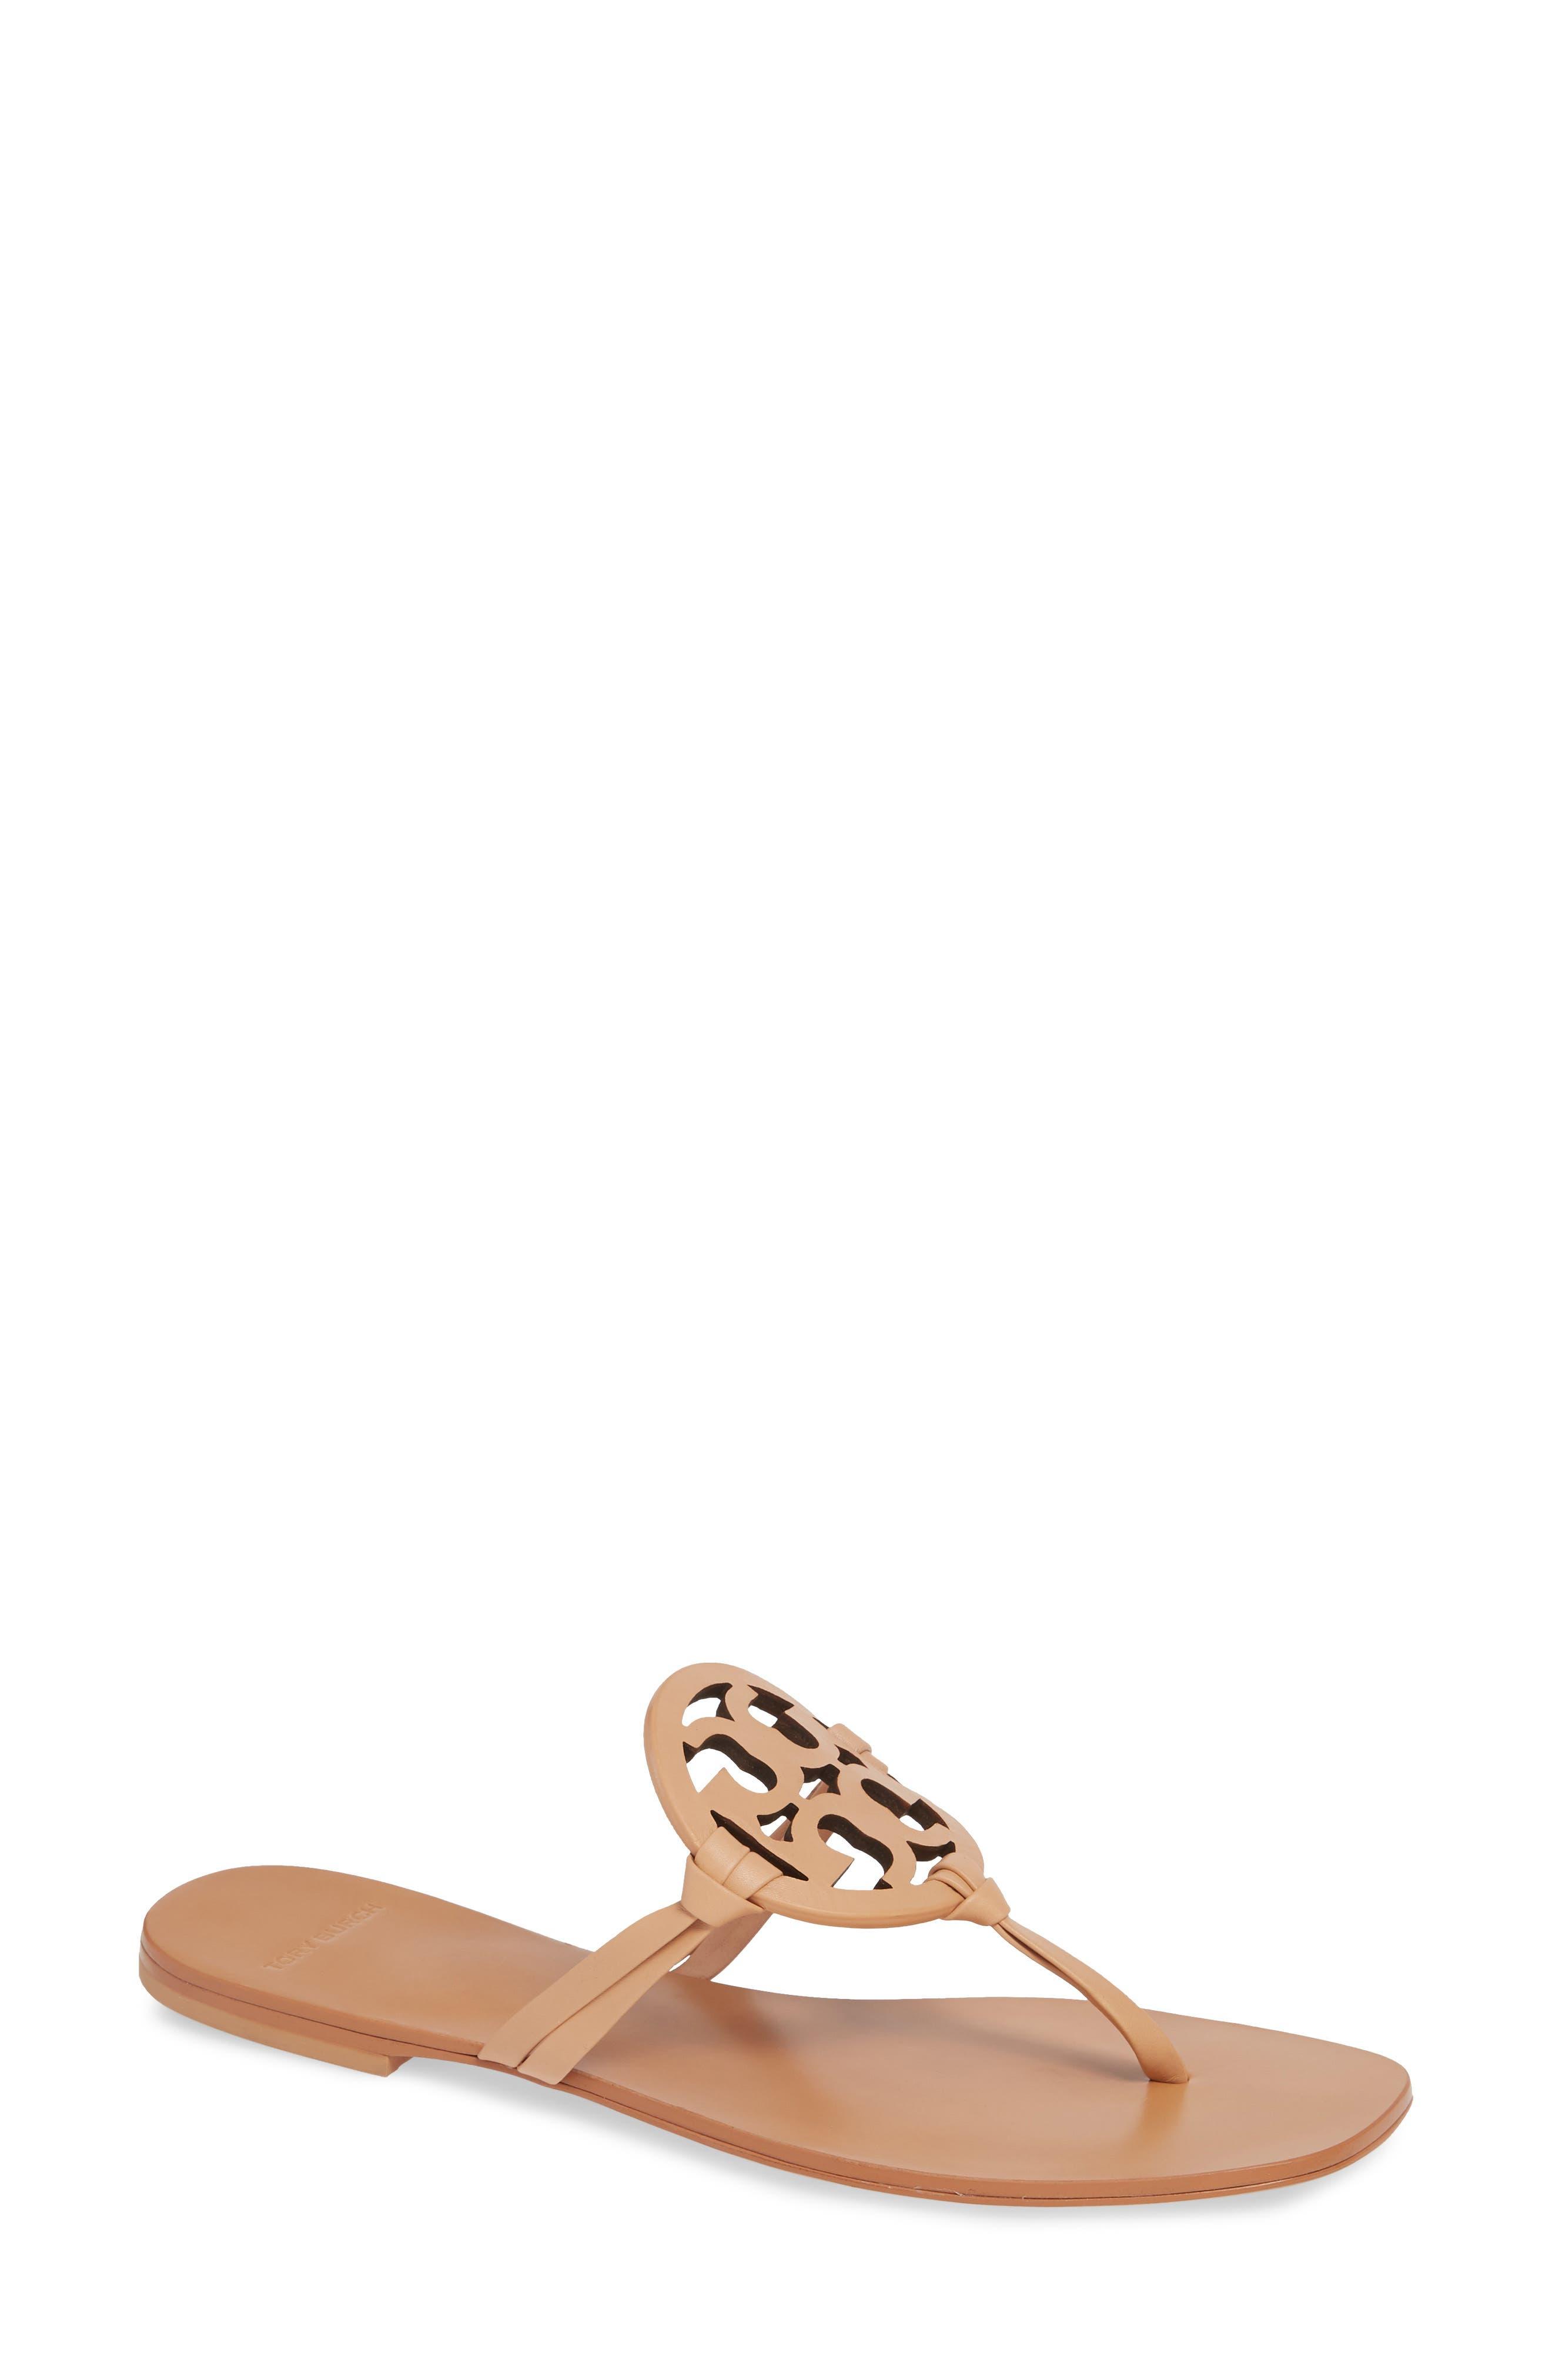 Miller Square-Toe Flat Slide Sandals in Natural Vachetta